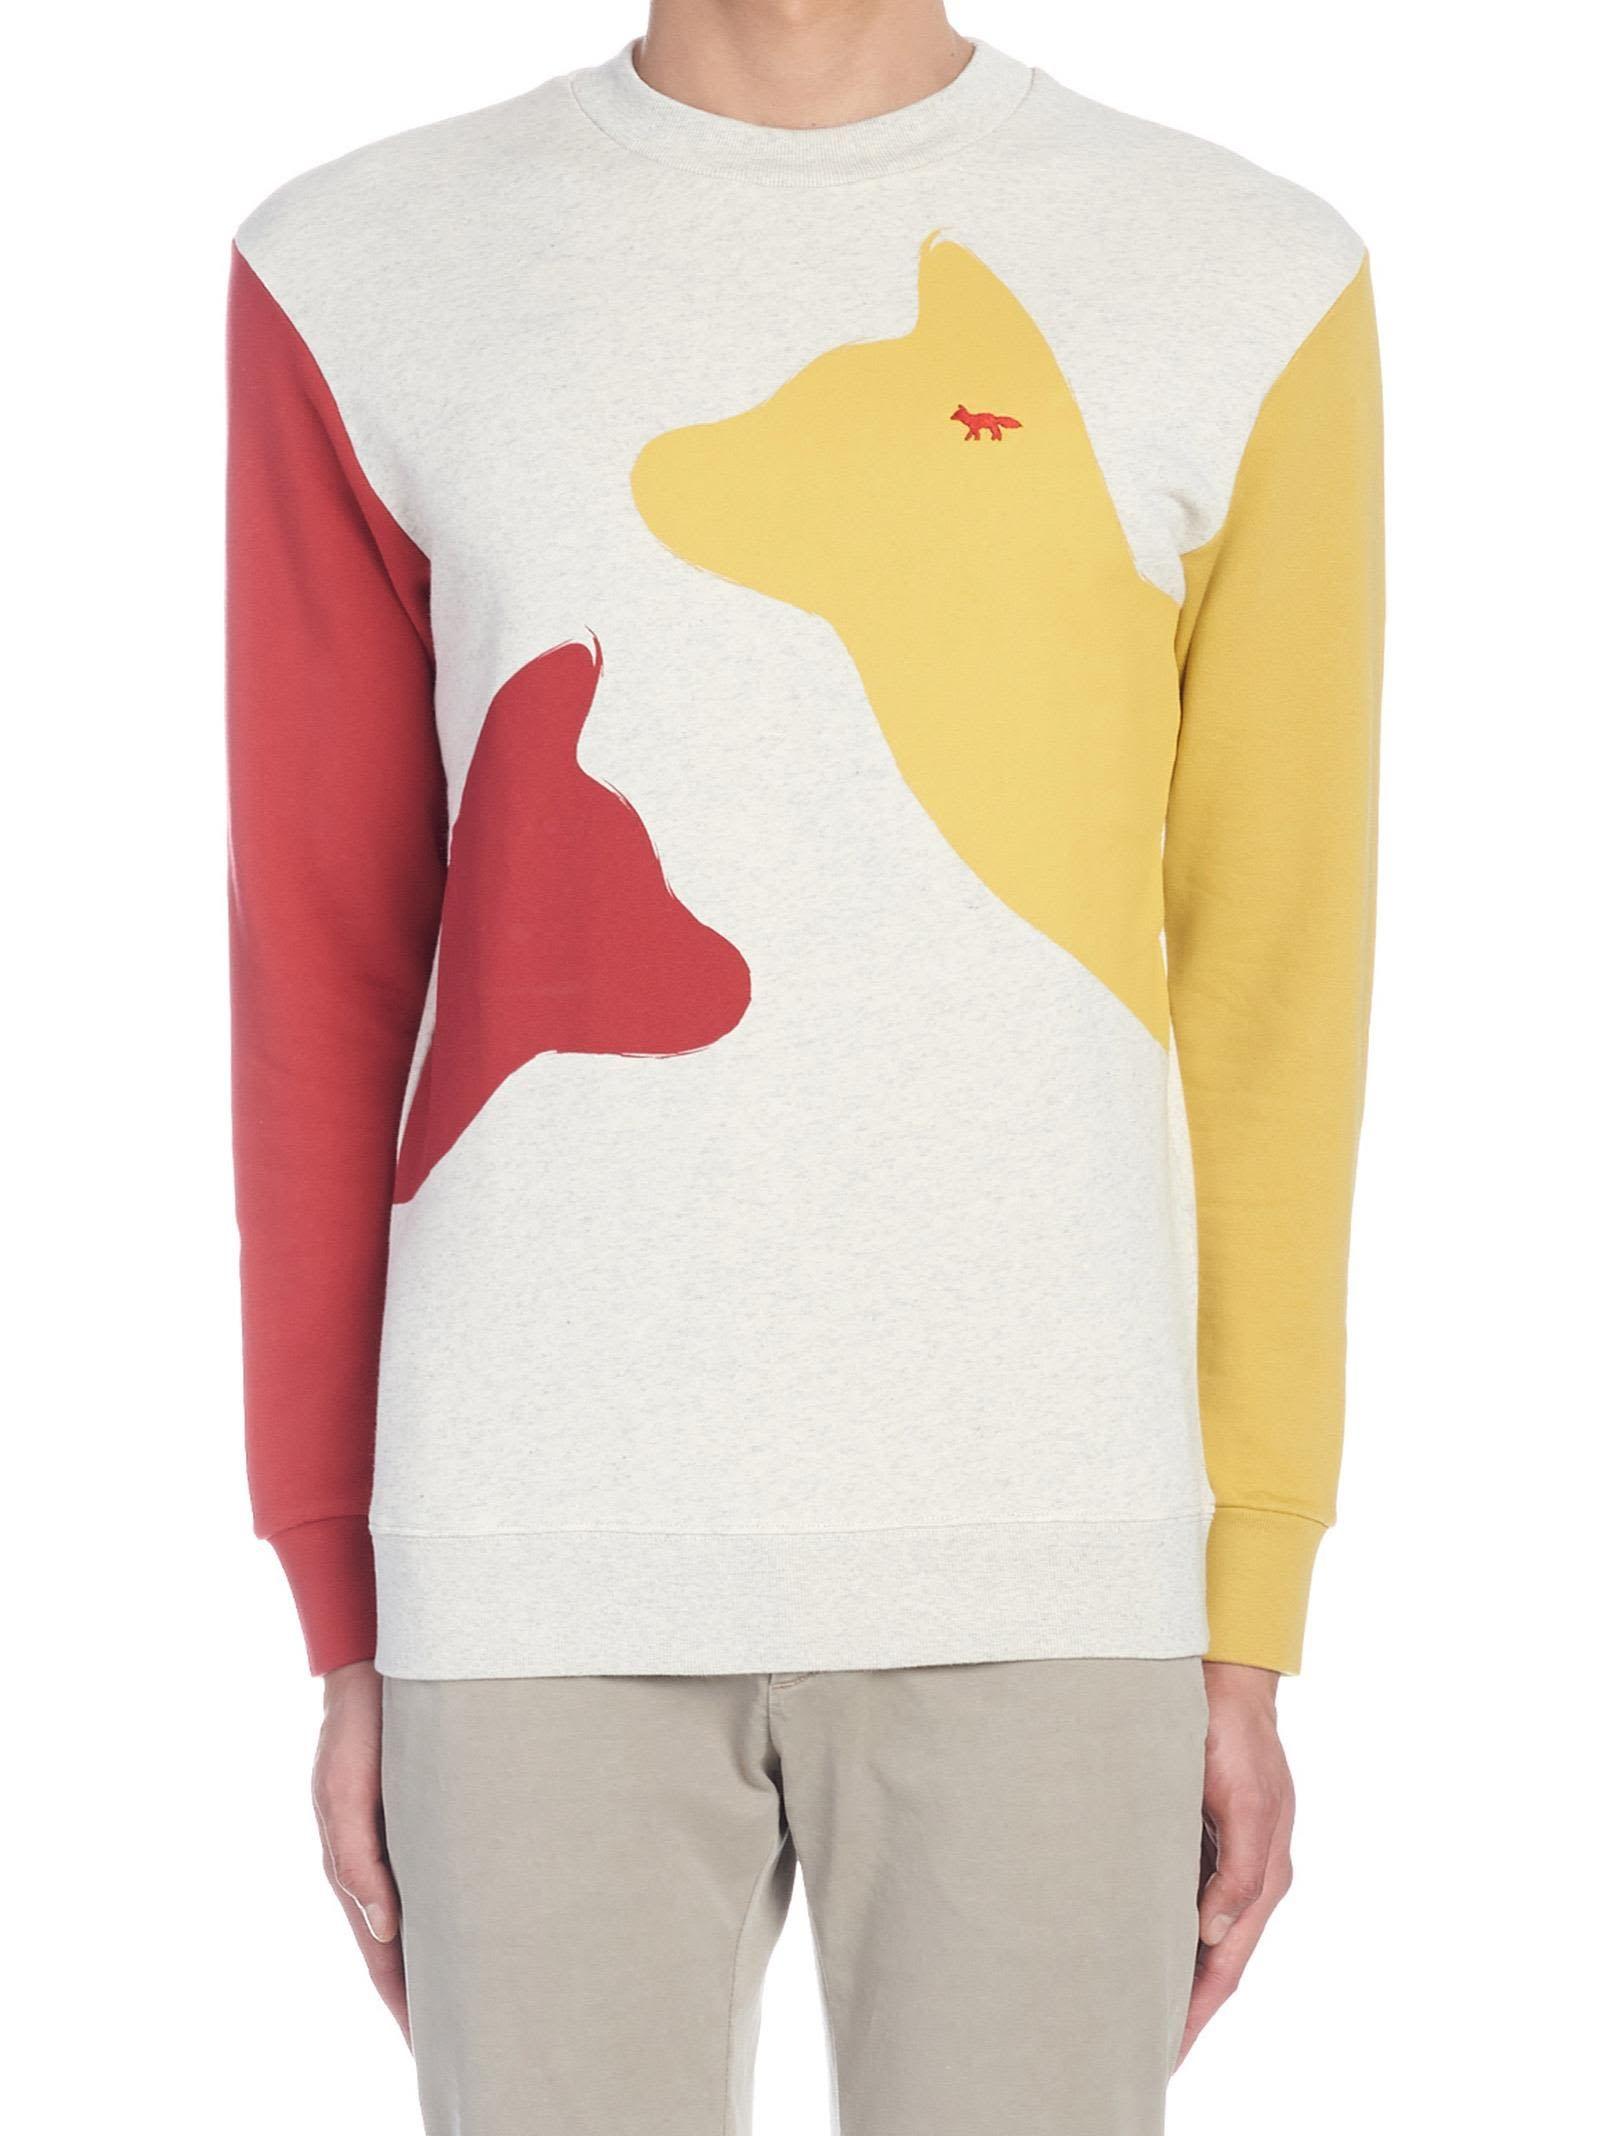 Maison Kitsune Meeting Foxes Sweatshirt In Multicolor Modesens [ 2136 x 1600 Pixel ]